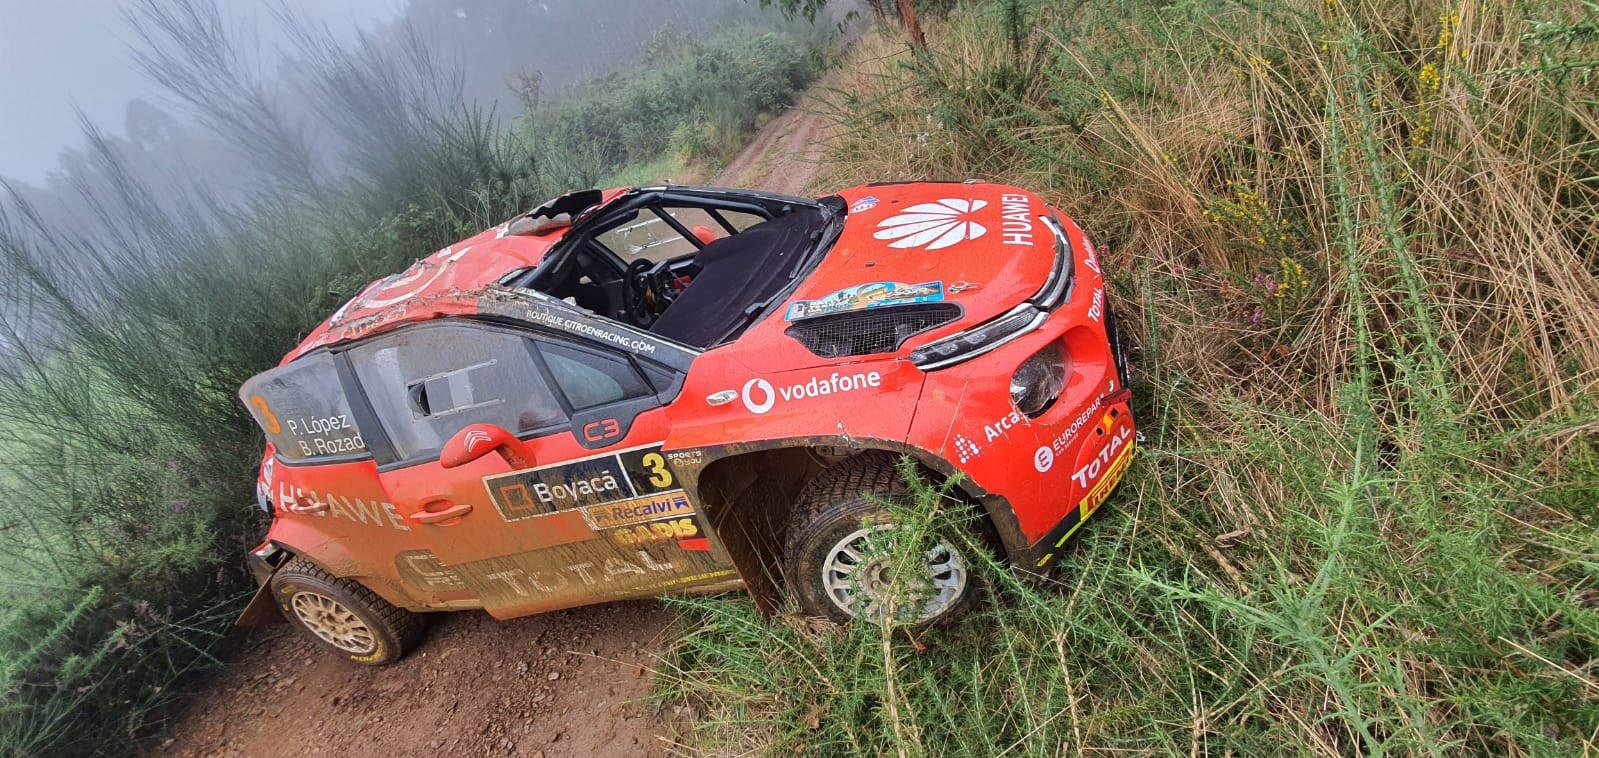 SCER + CERT: Rallye Terra da Auga - Comarca de Arzúa [25-26 Septiembre] - Página 2 Ei2O5e1WkAEwt-u?format=jpg&name=large